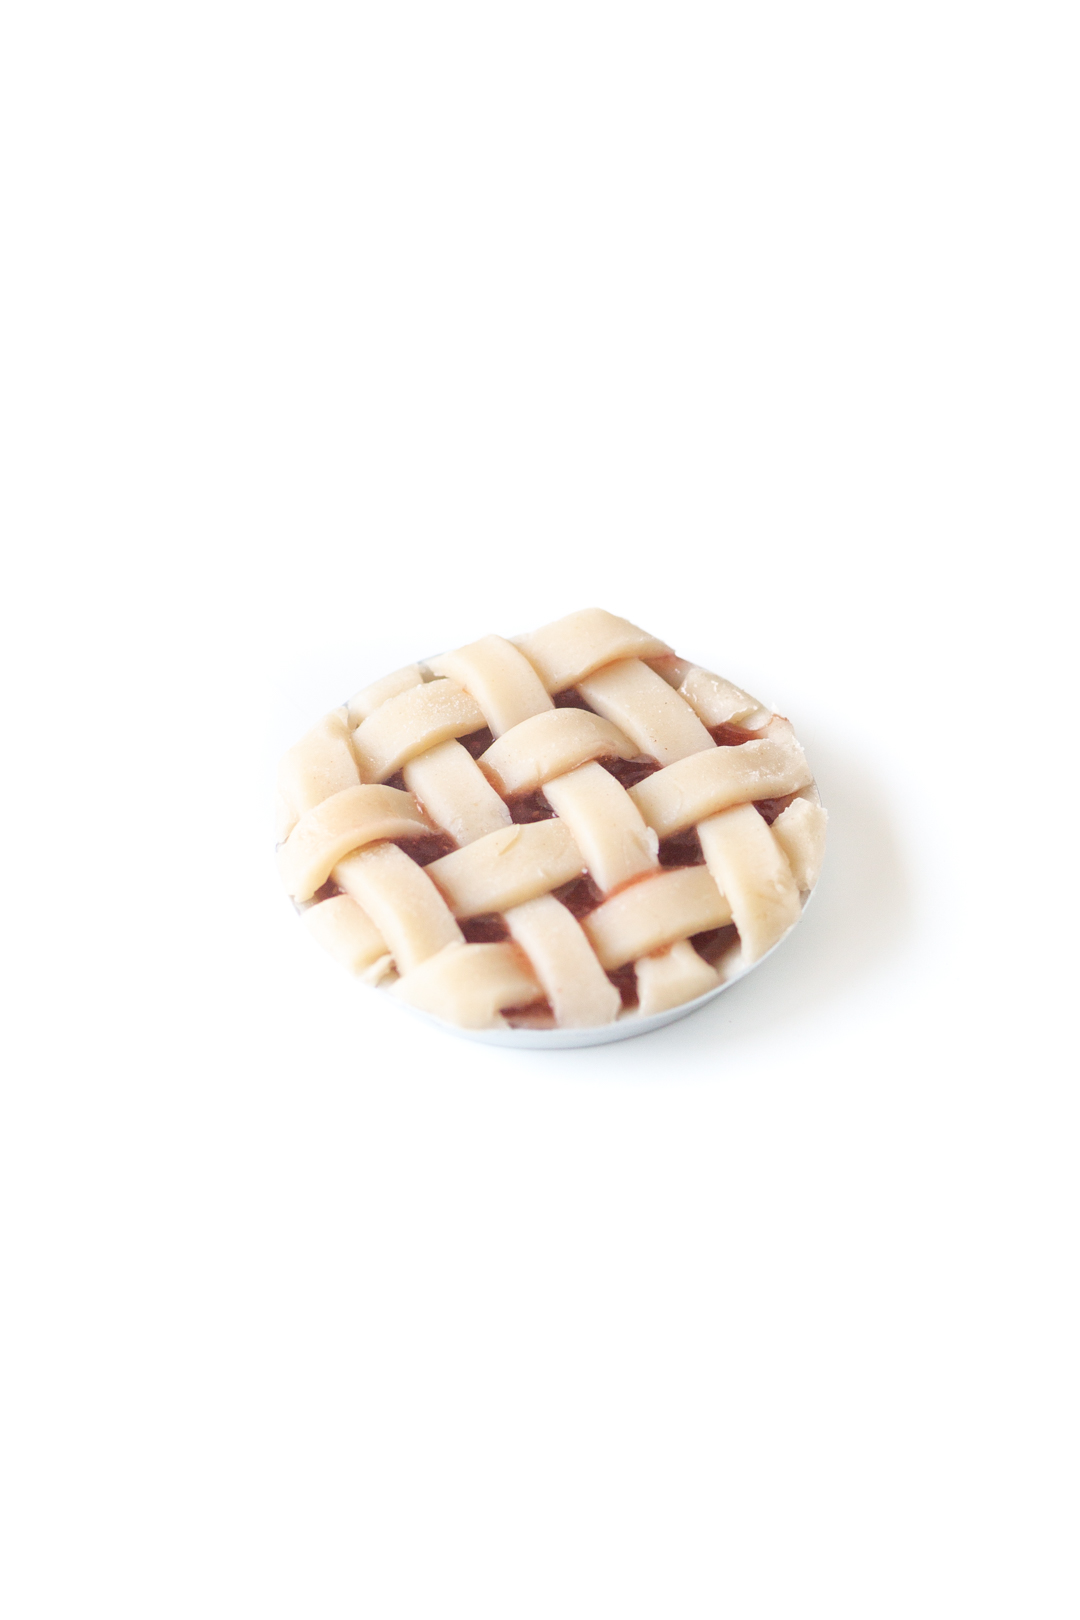 mini lattice pie before putting into the oven